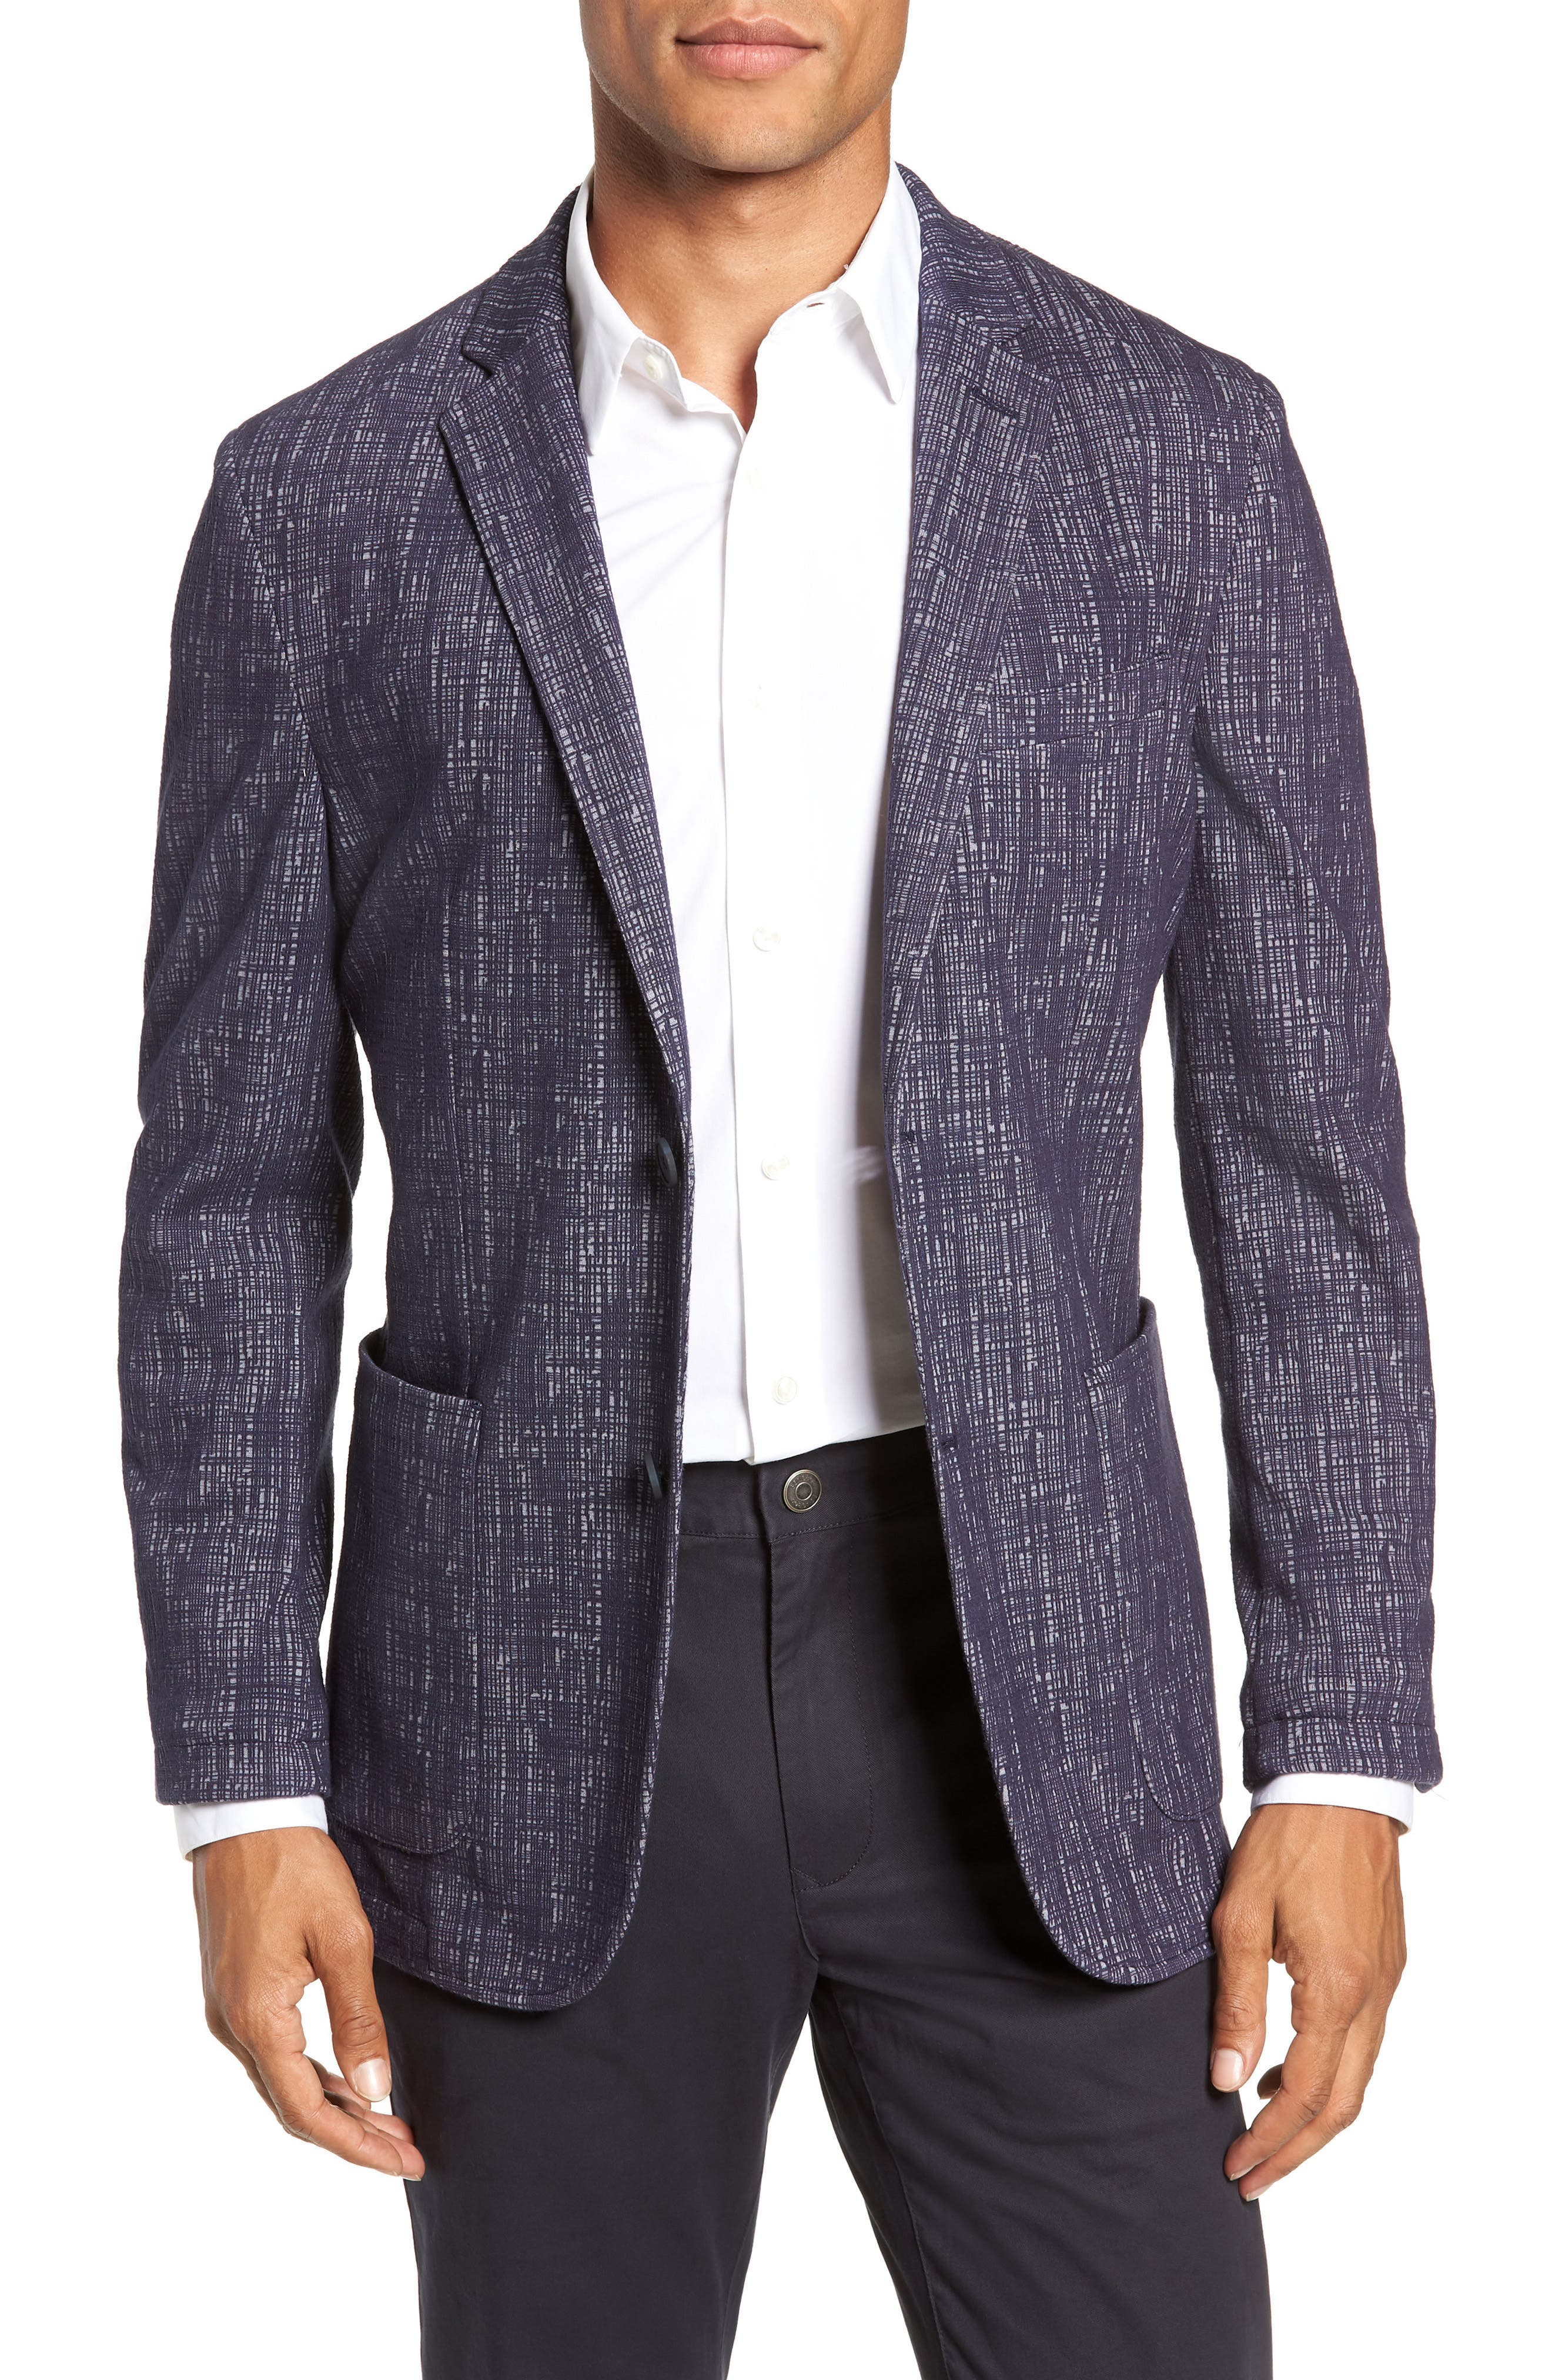 VINCE CAMUTO,                             Mesh Pattern Slim Fit Sport Coat,                             Main thumbnail 1, color,                             BLUE